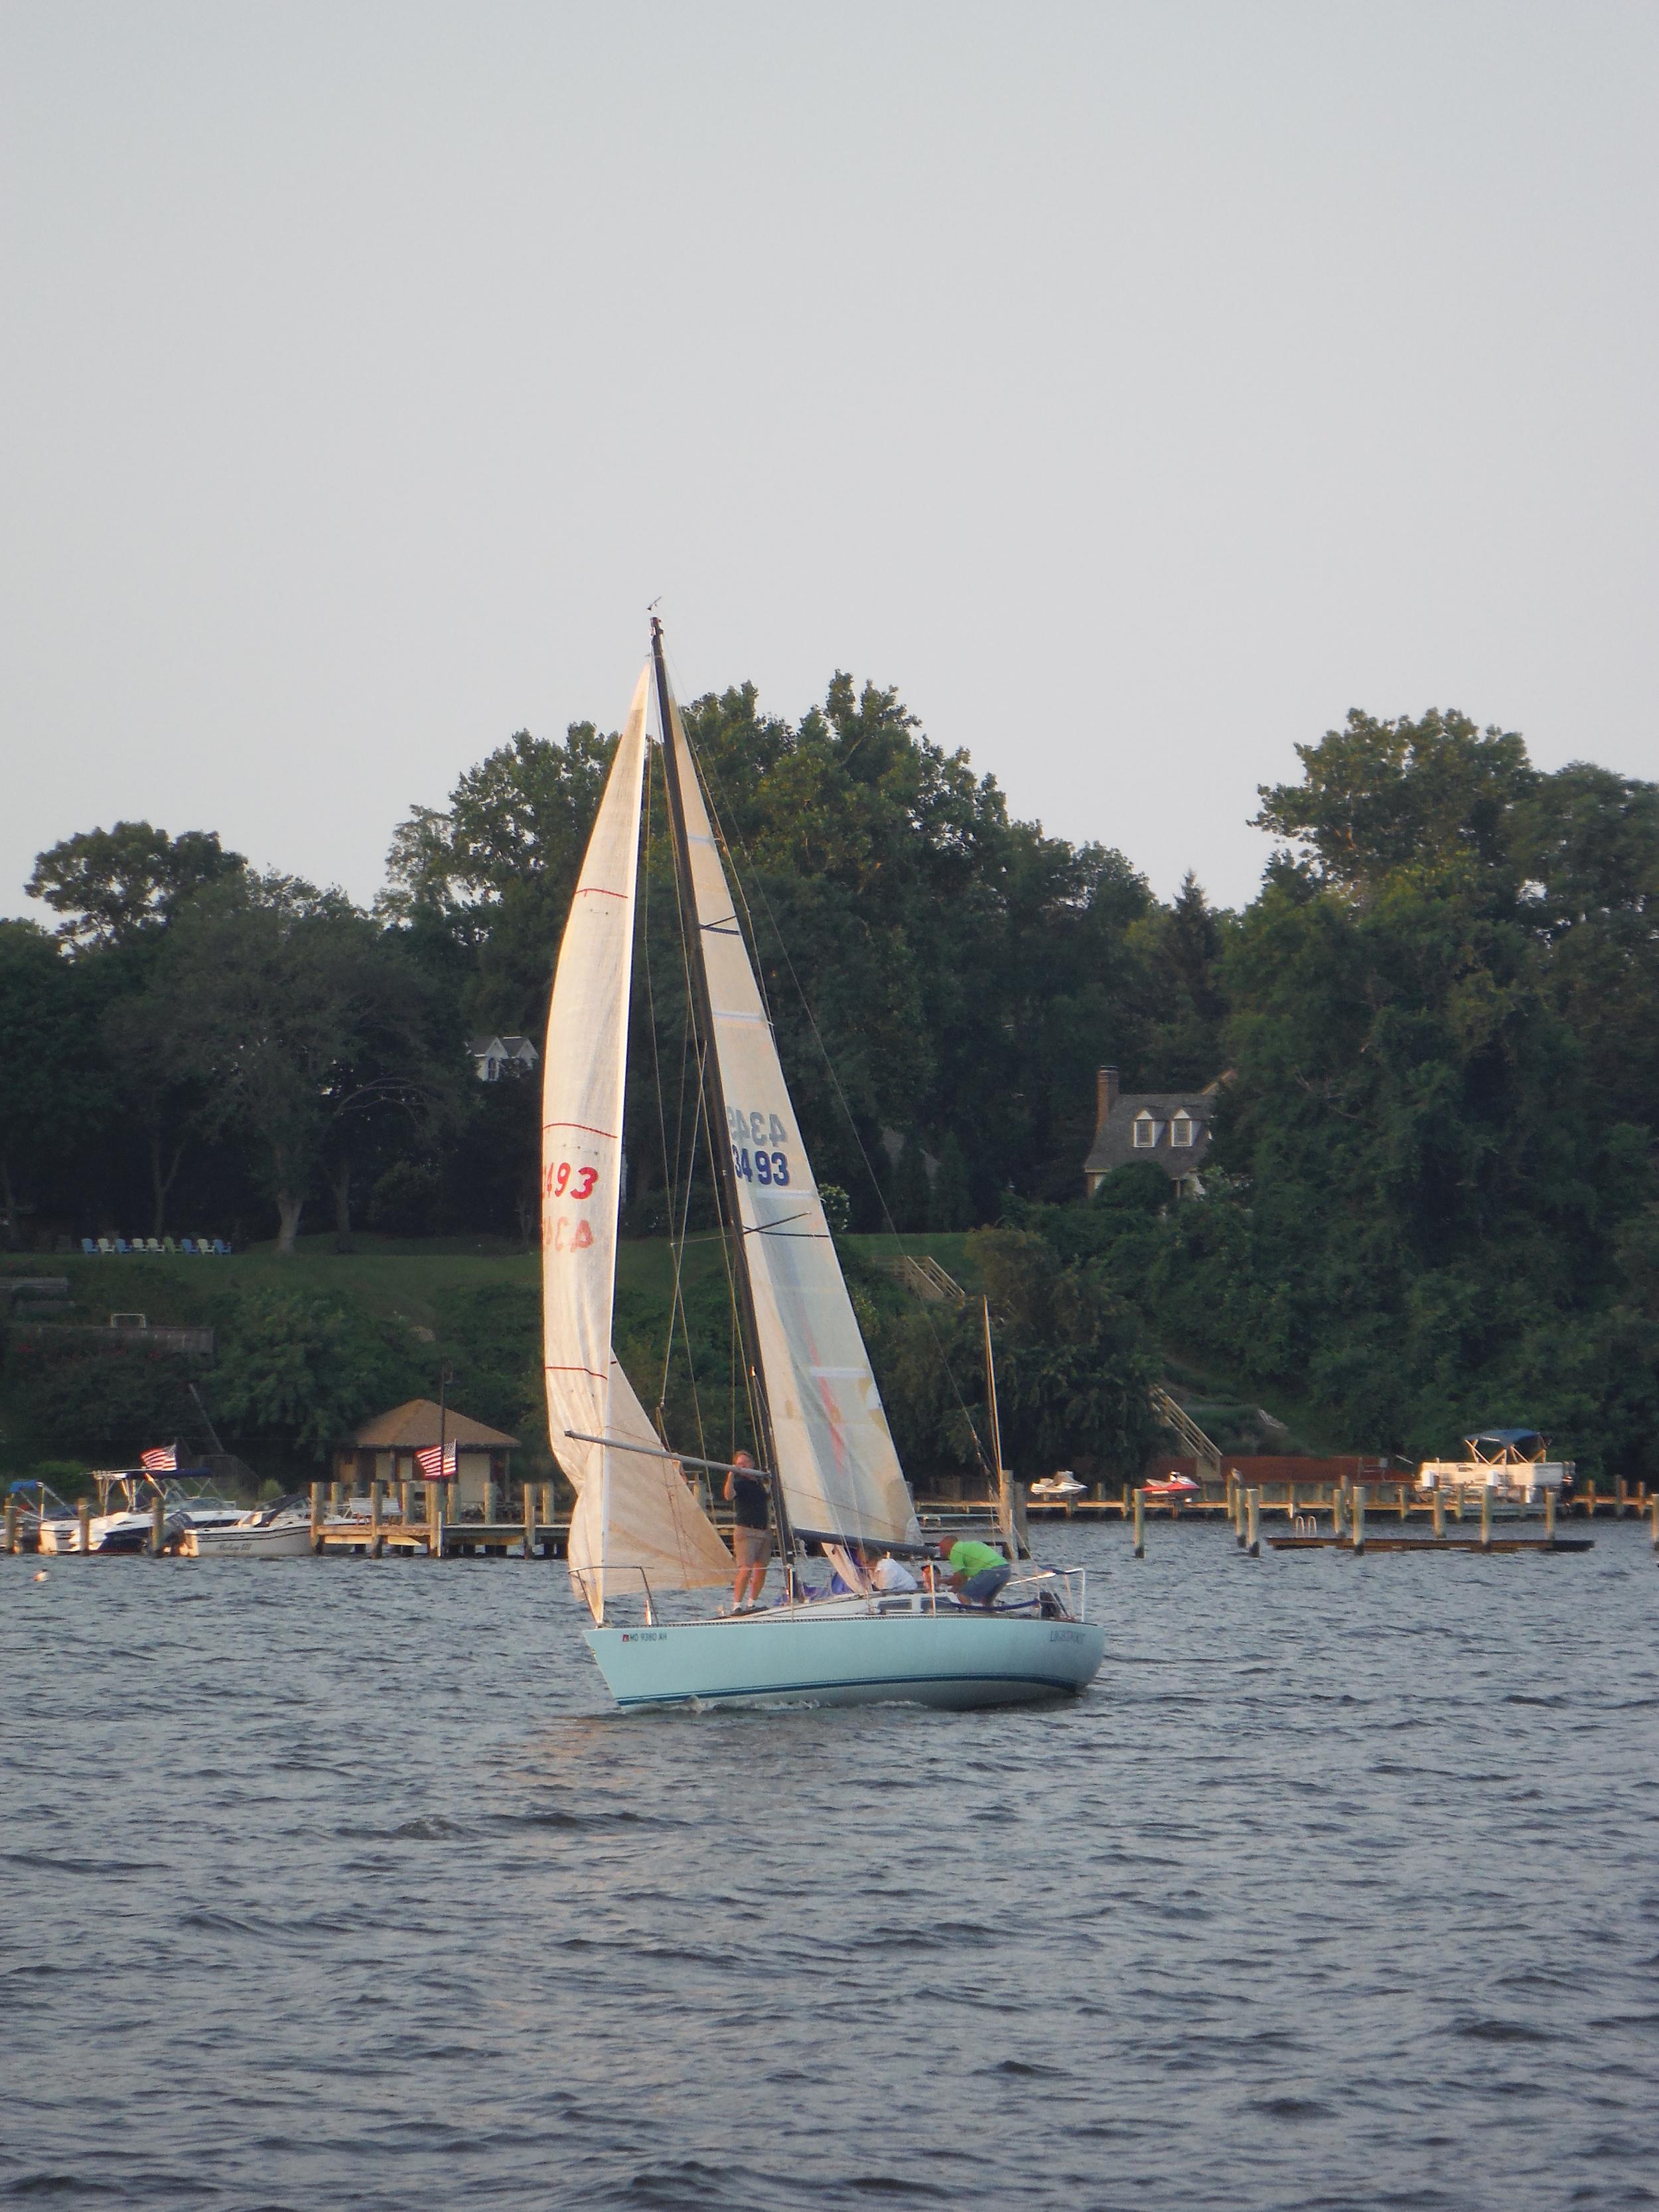 7-30-14 Race Commitee Photos 095.JPG